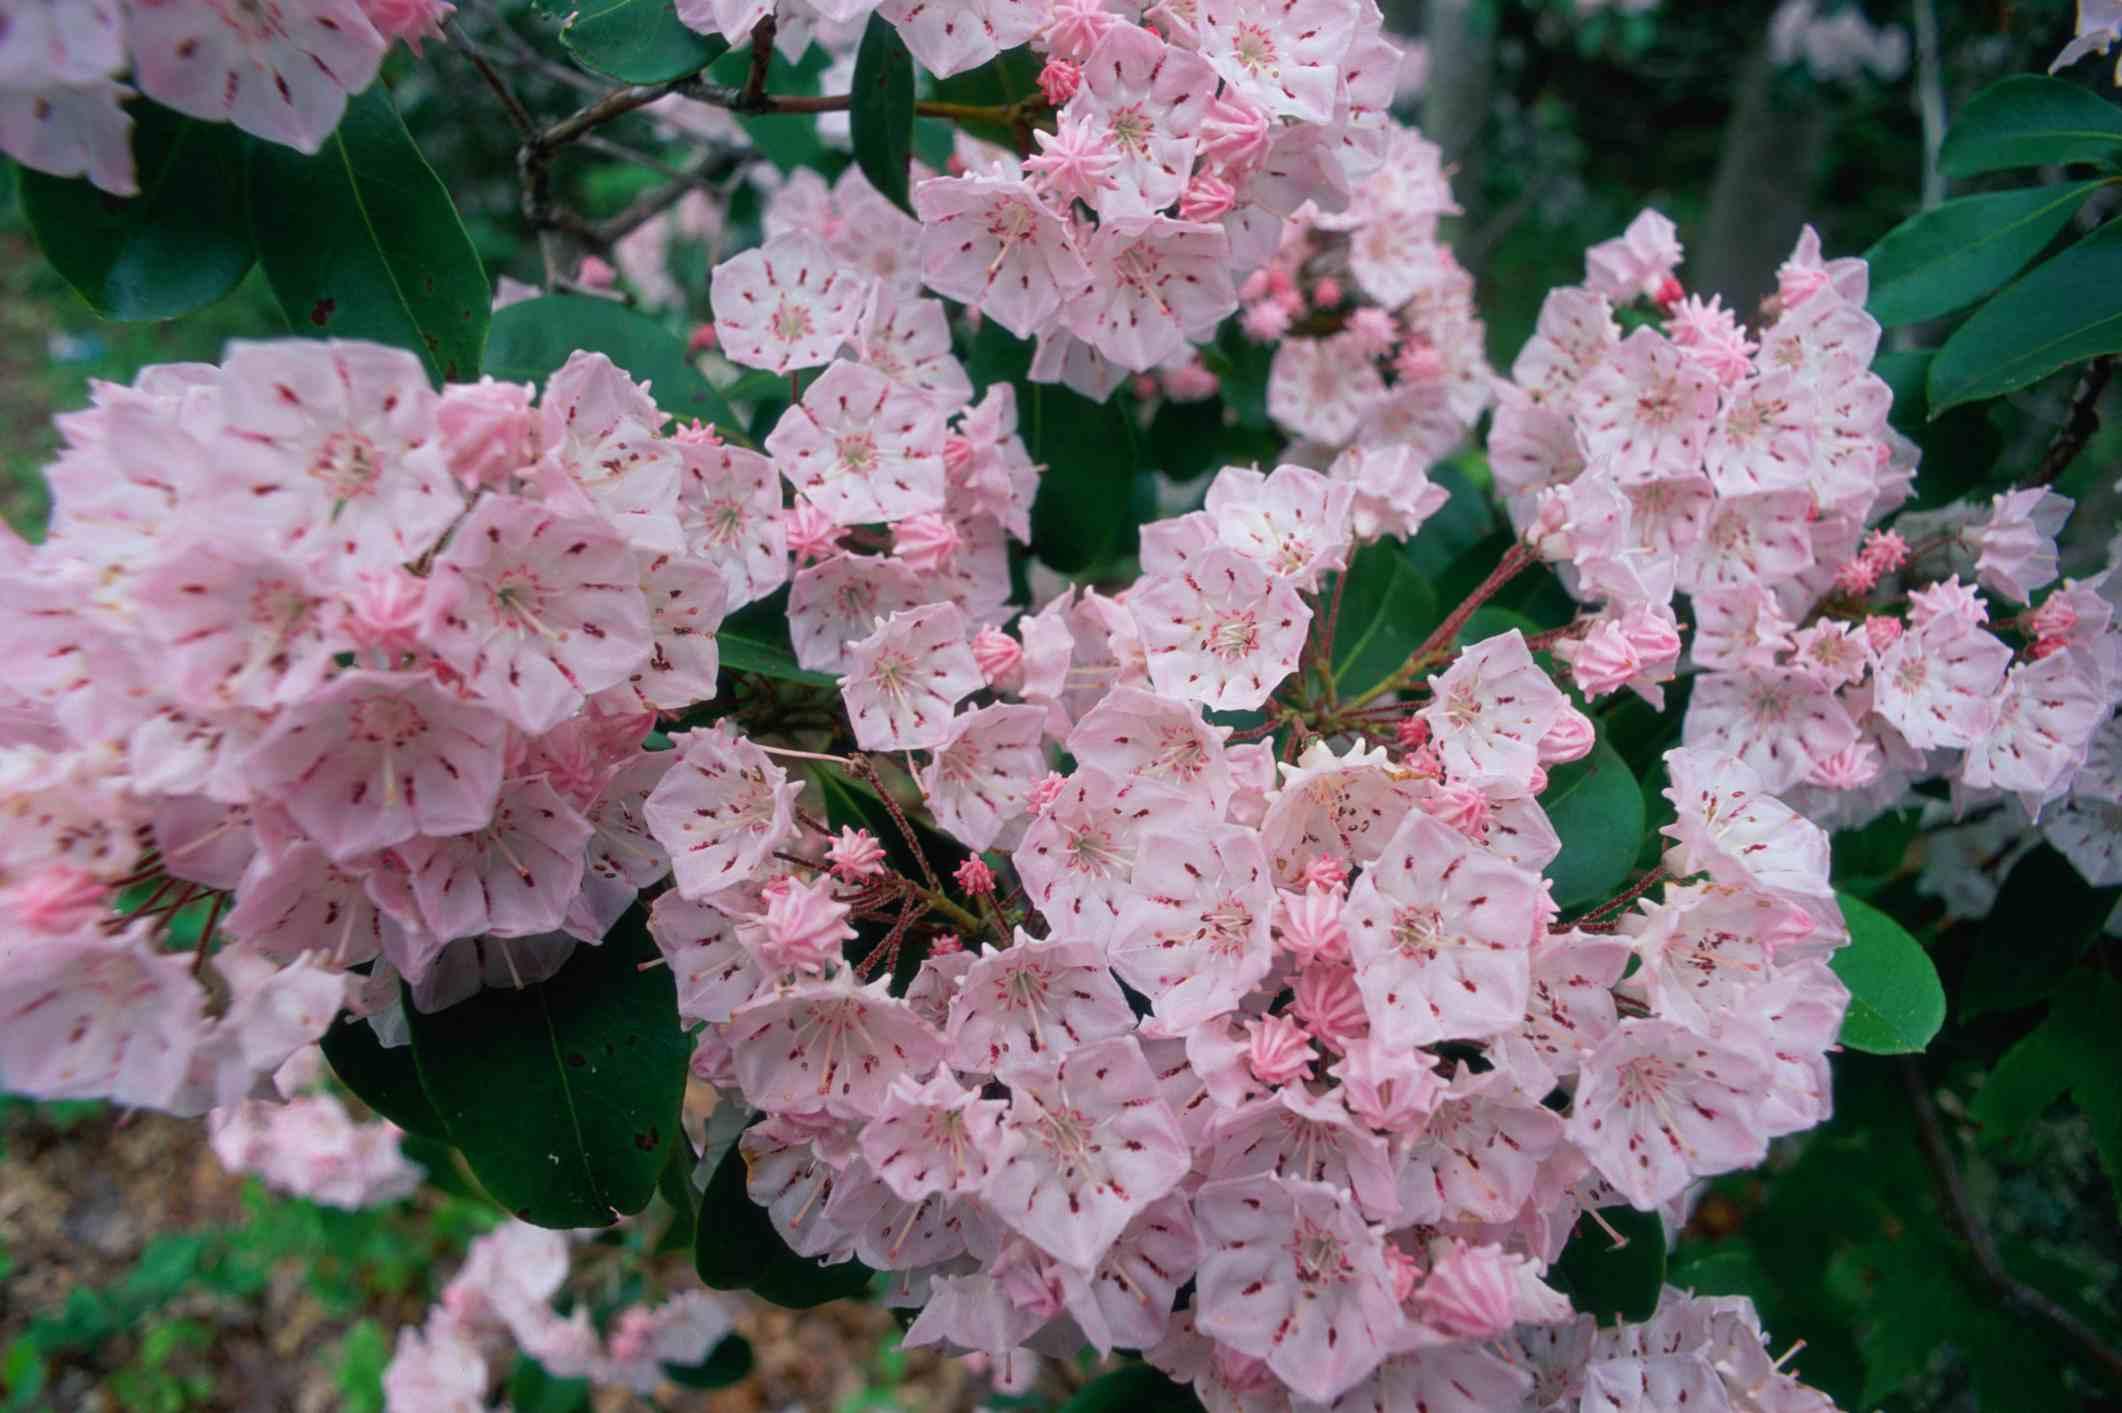 Mountain laurel blooming in light pink.